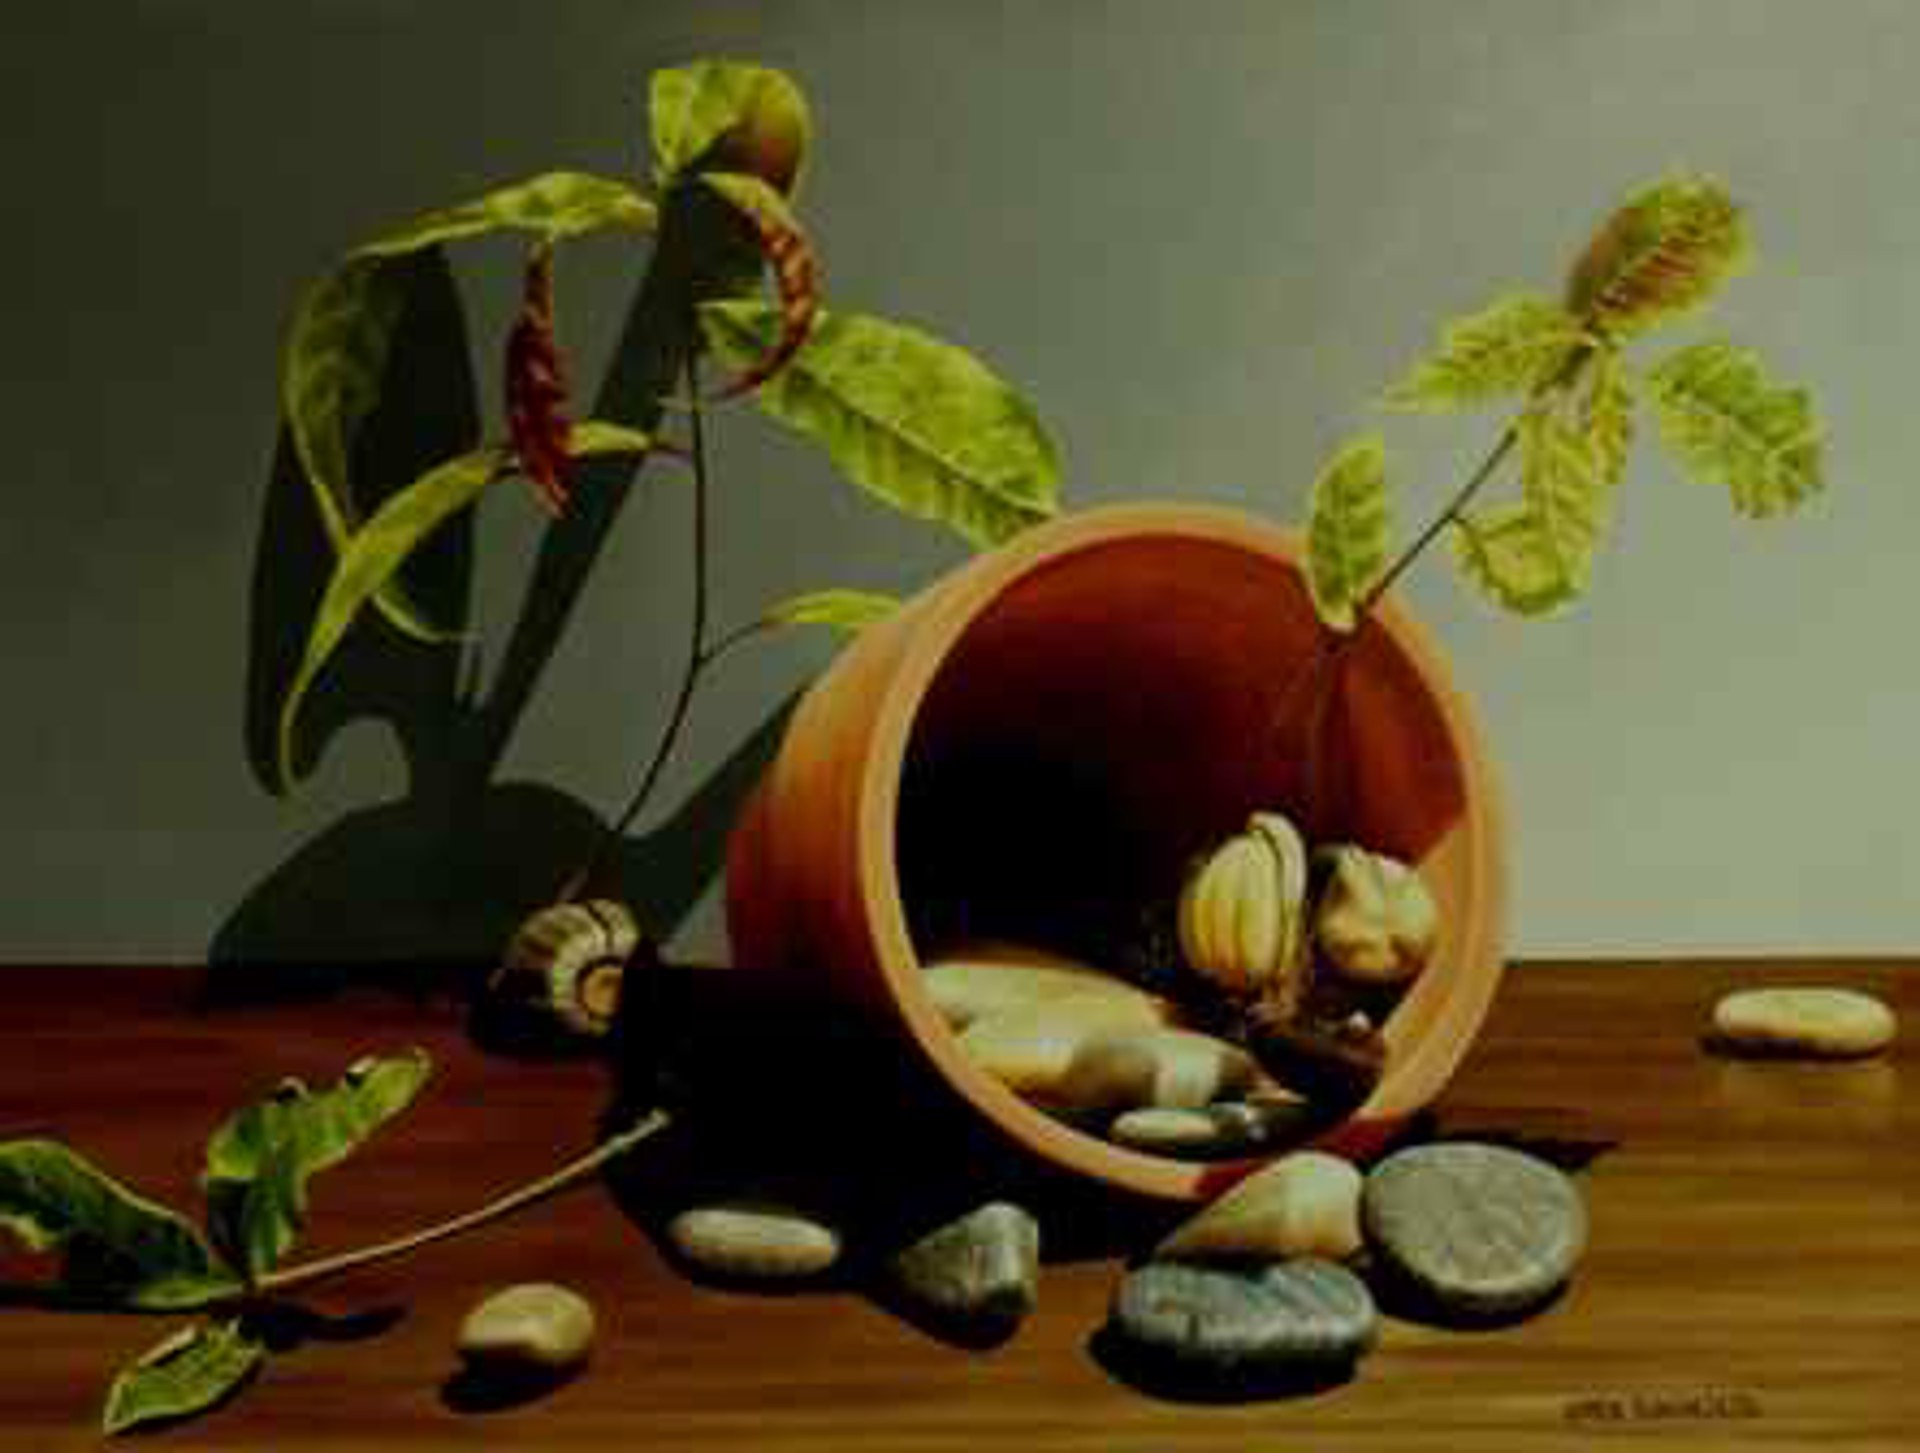 Sapling and Rocks by Loren DiBenedetto